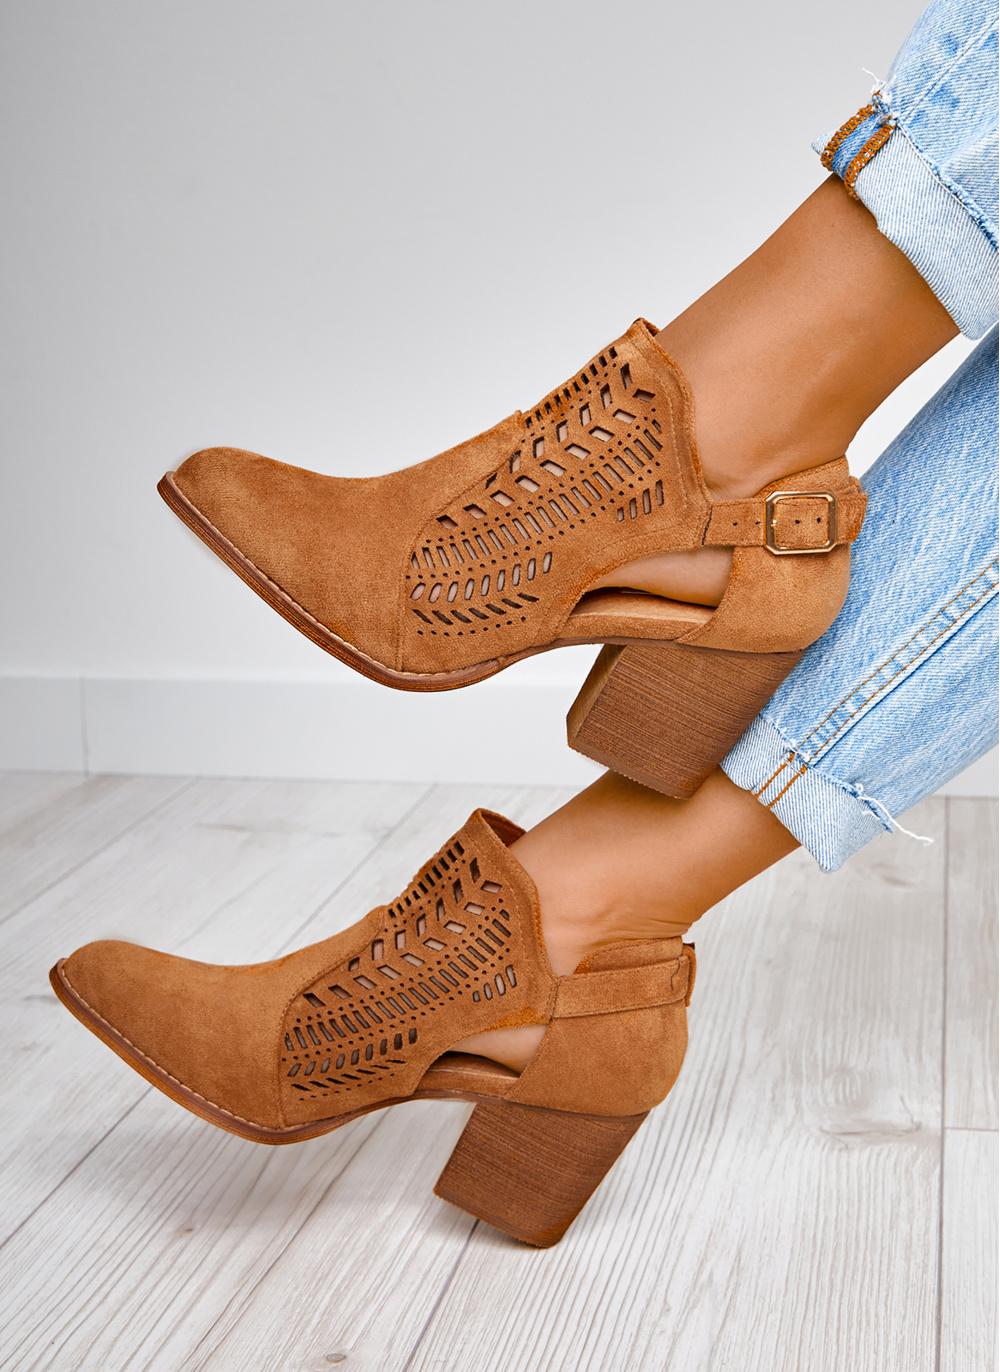 Brazowe Botki Aztecs W Sklepie Deezee Pl Boots Ankle Boot Shoes